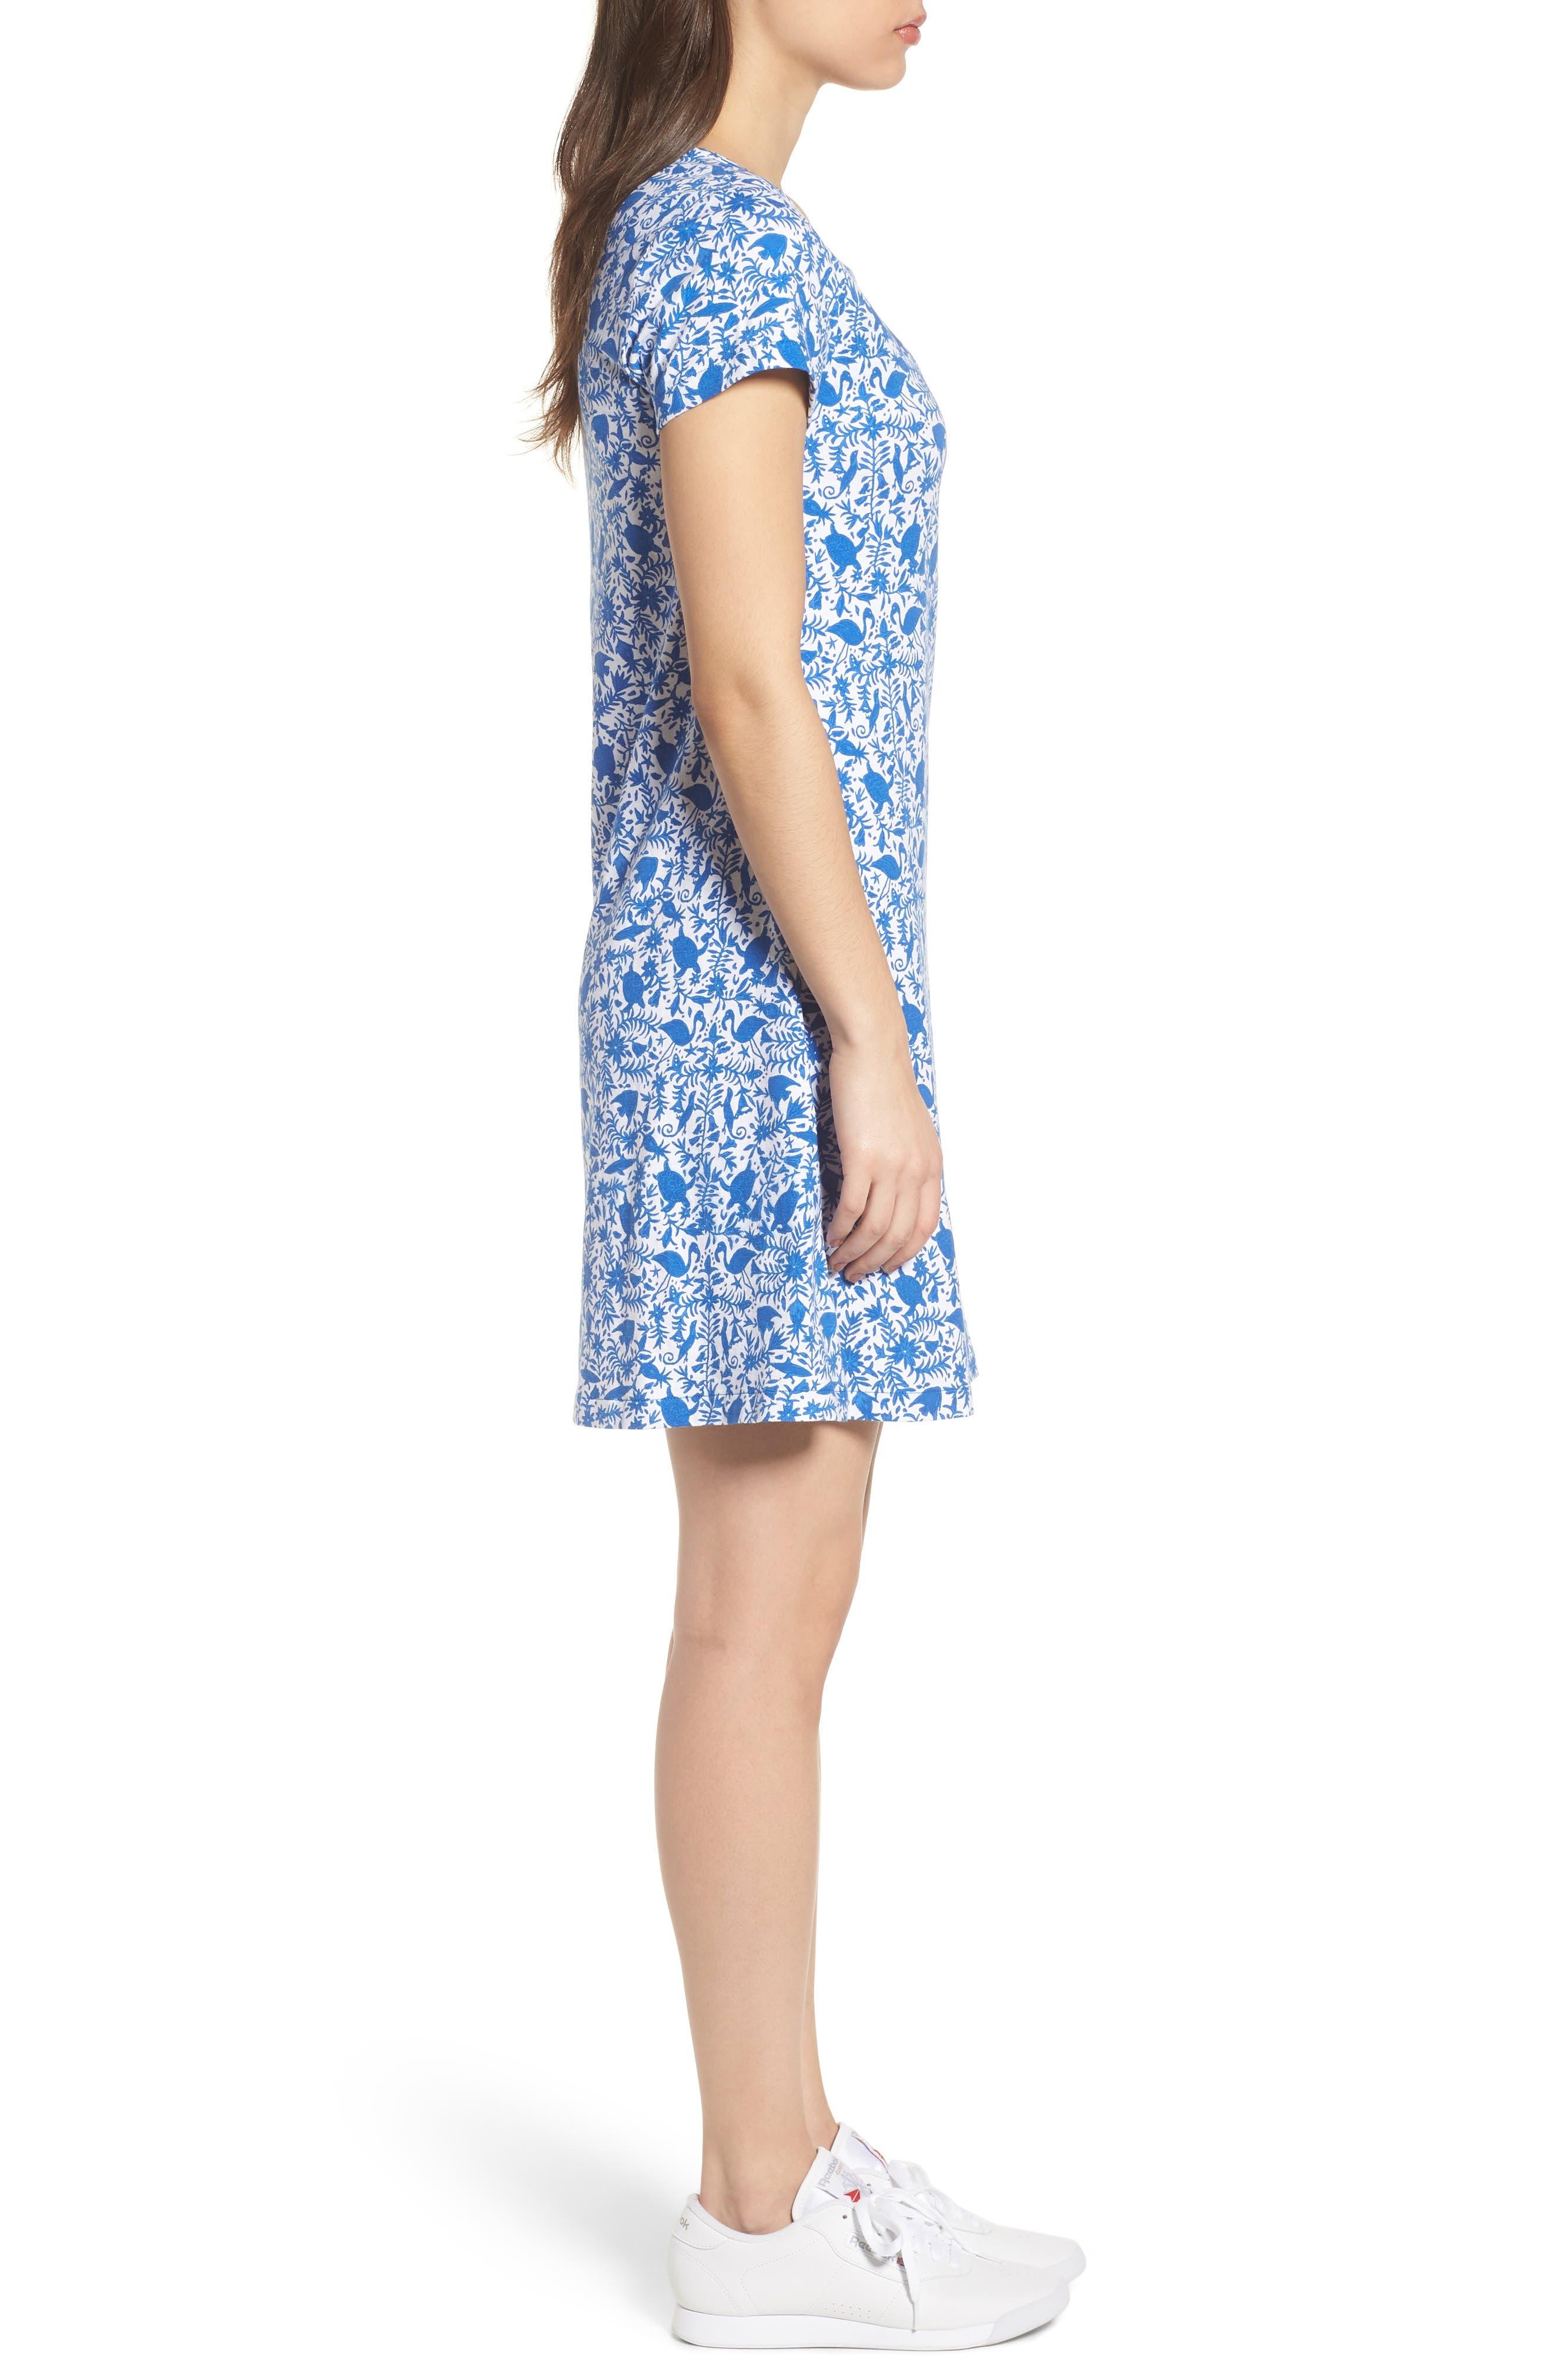 Bahamas Otomi Print Stretch Cotton Dress,                             Alternate thumbnail 3, color,                             Yacht Blue